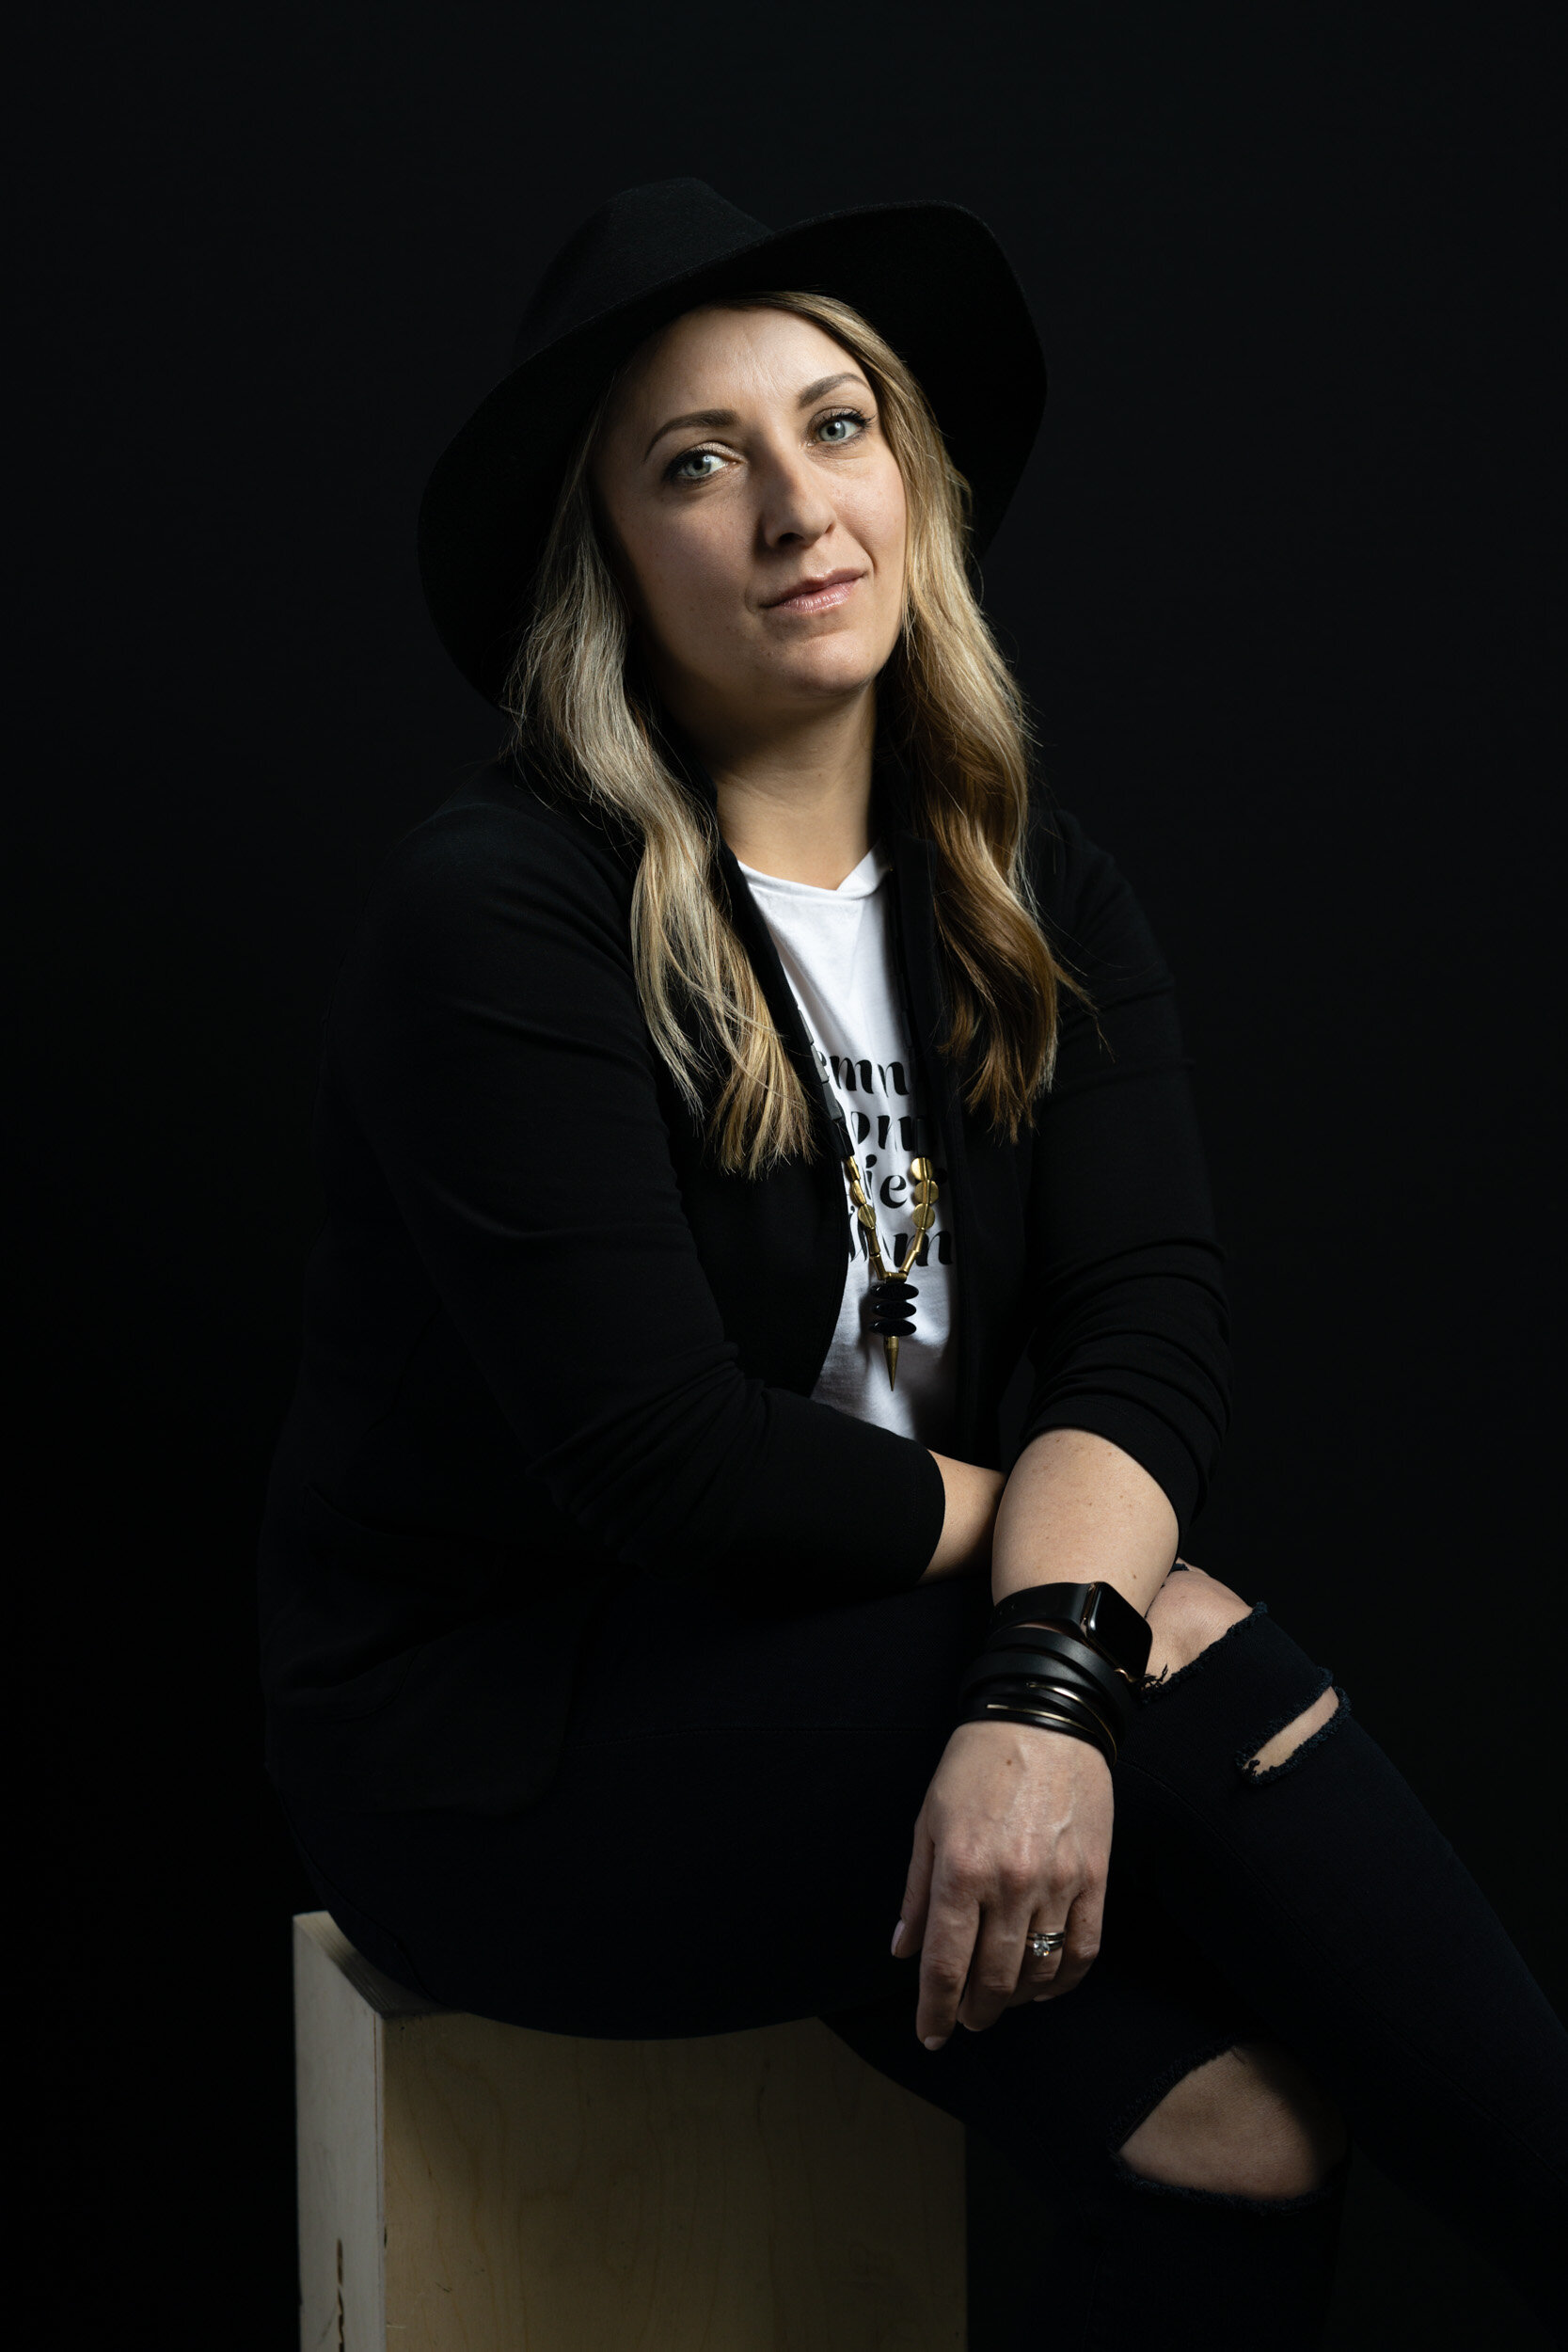 Krista Executive Creative Director at GMR